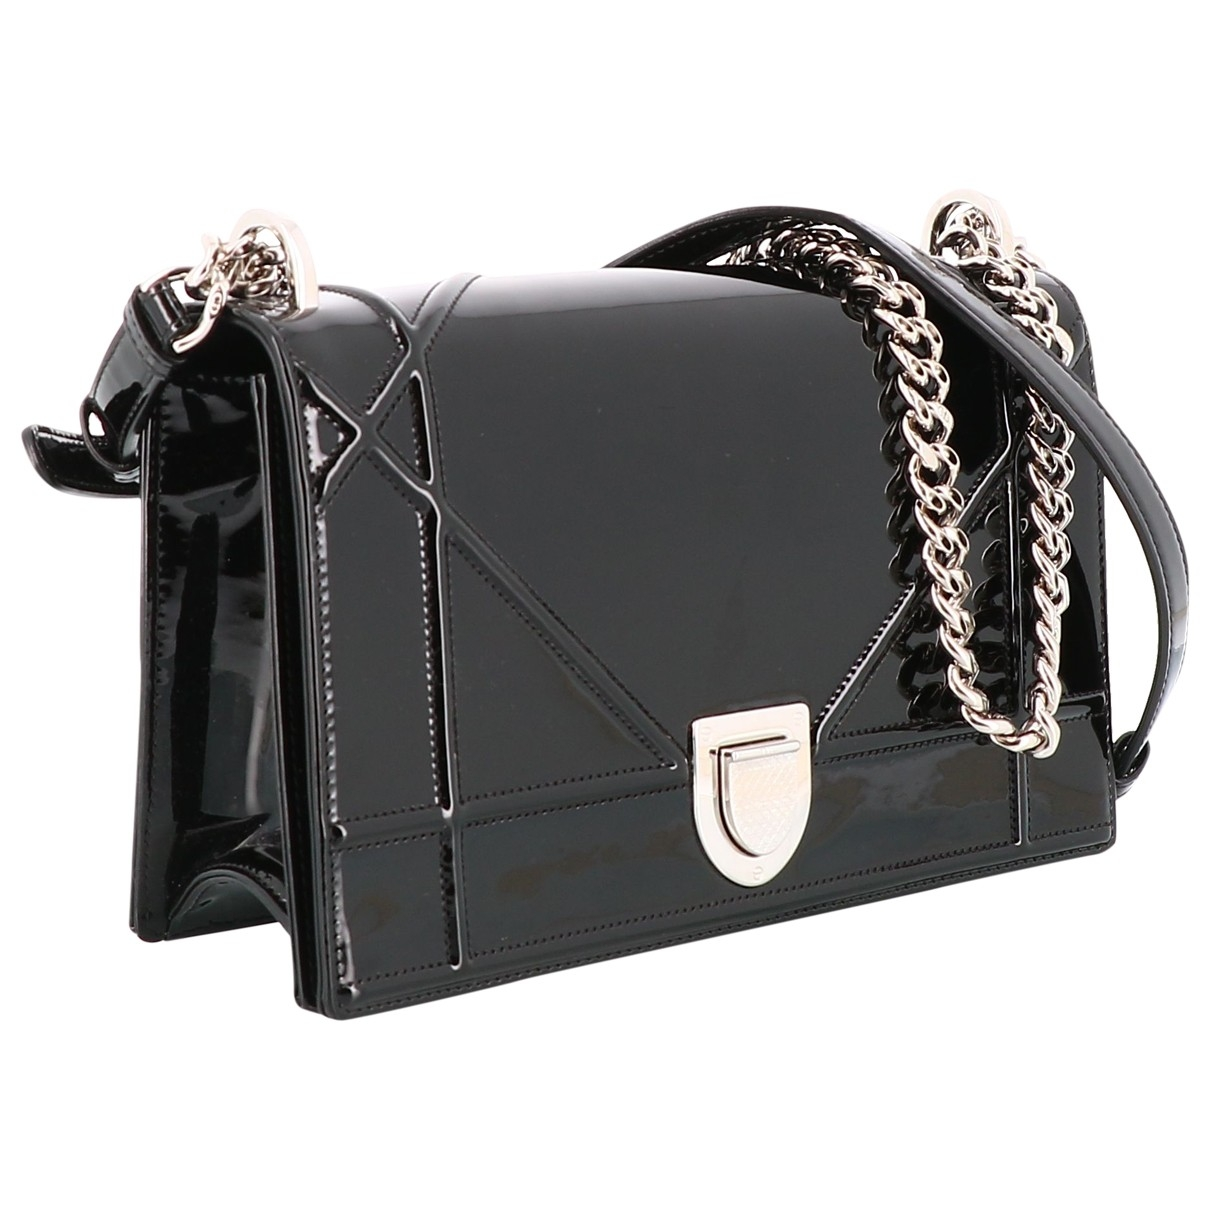 Dior Diorama Black Patent leather handbag for Women \N